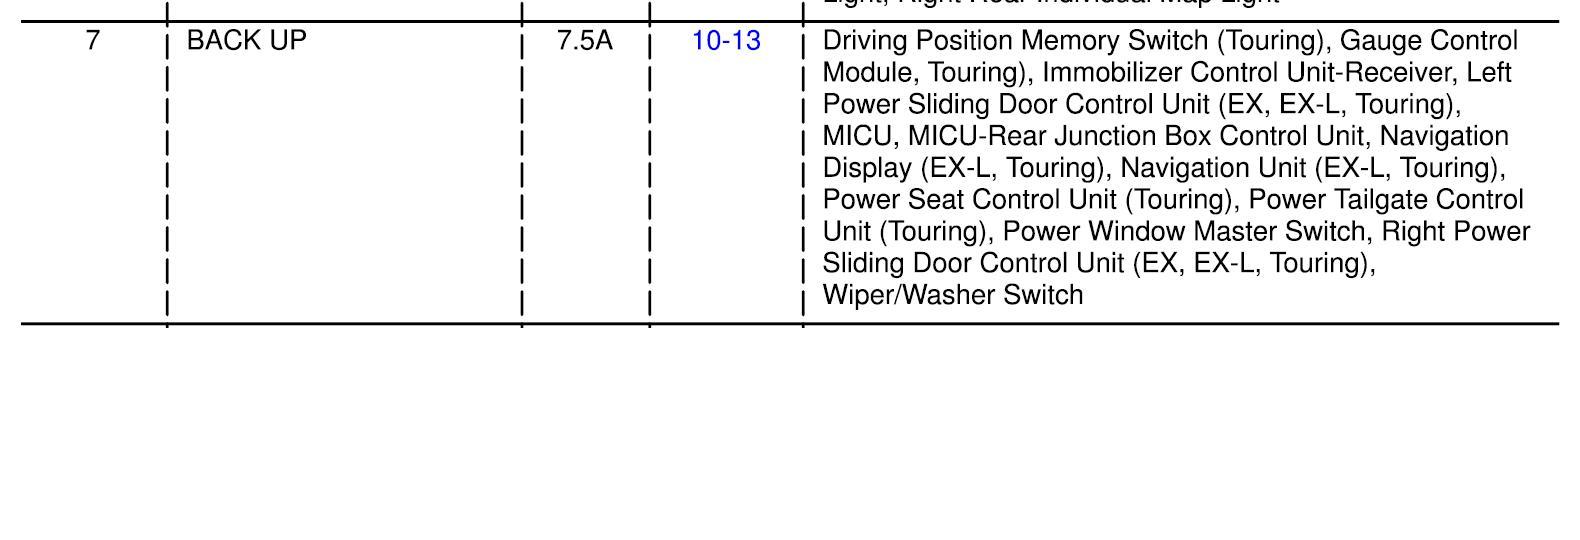 Diagnosing a power draw | Honda Odyssey Forum on odyssey transmission diagram, odyssey parts diagram, odyssey fuse diagram, 2005 honda odyssey electrical diagram, odyssey engine diagram,